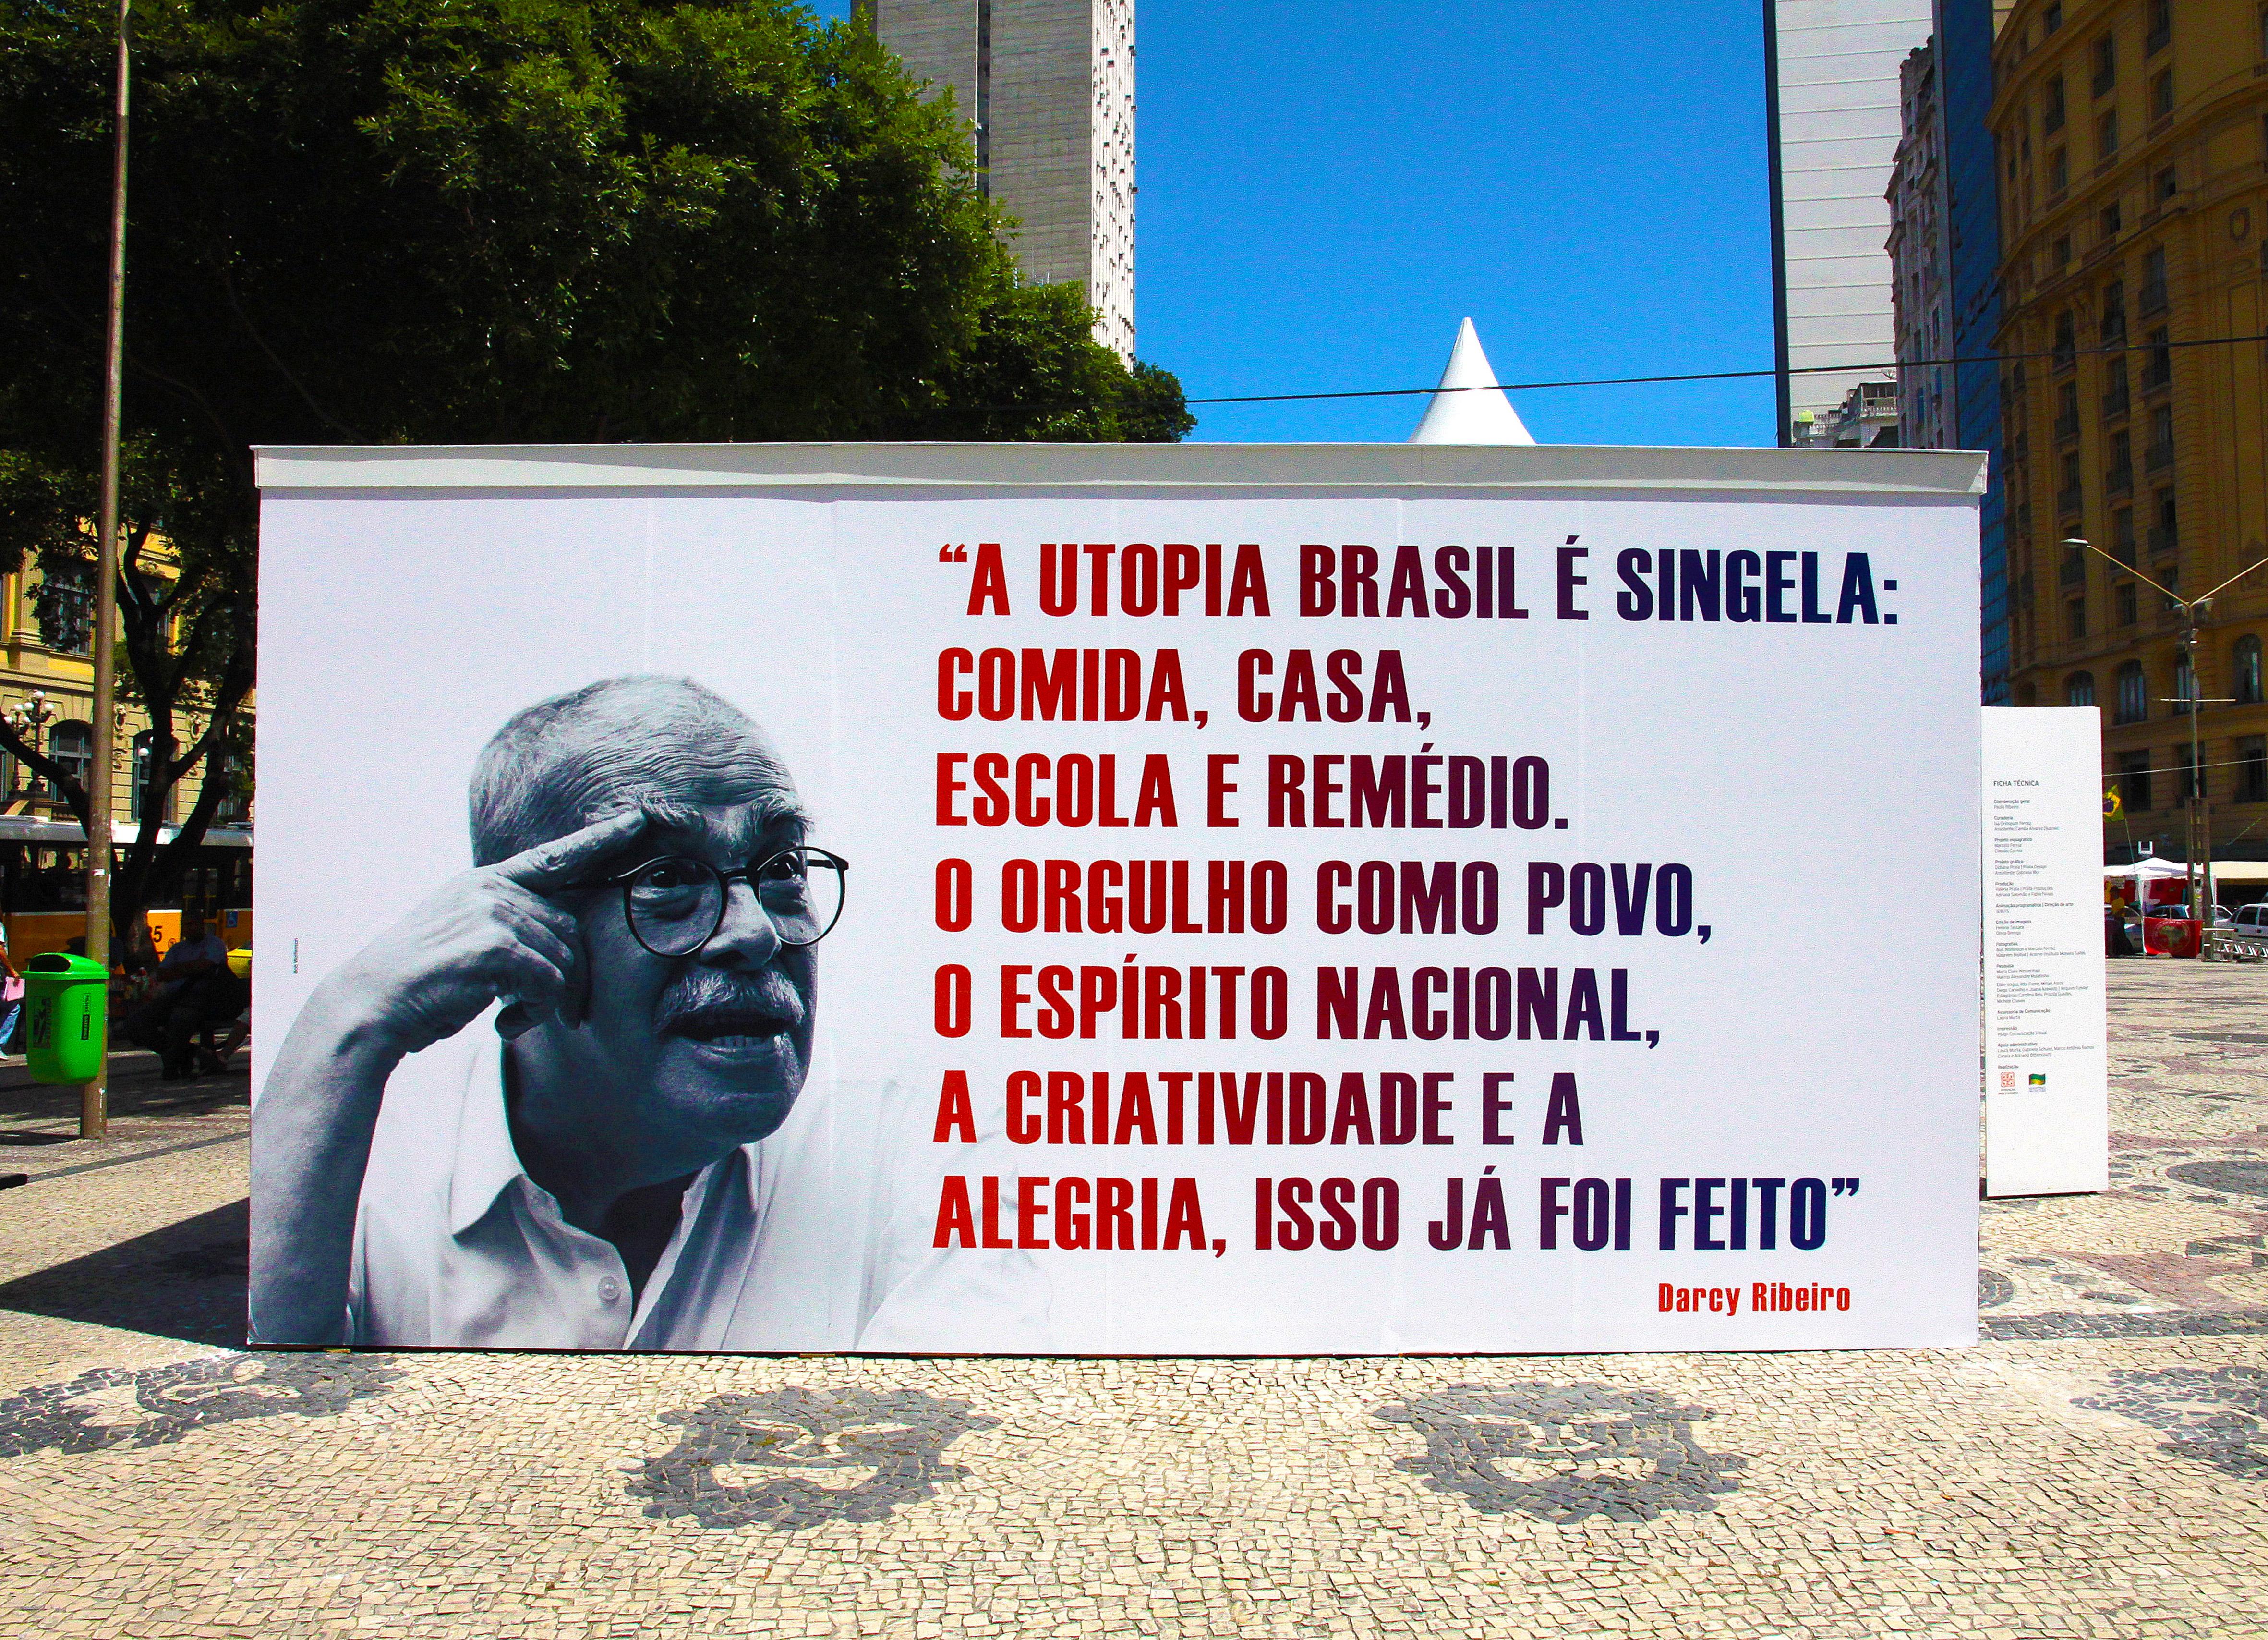 Darcy Ribeiro - A Utopia Brasil